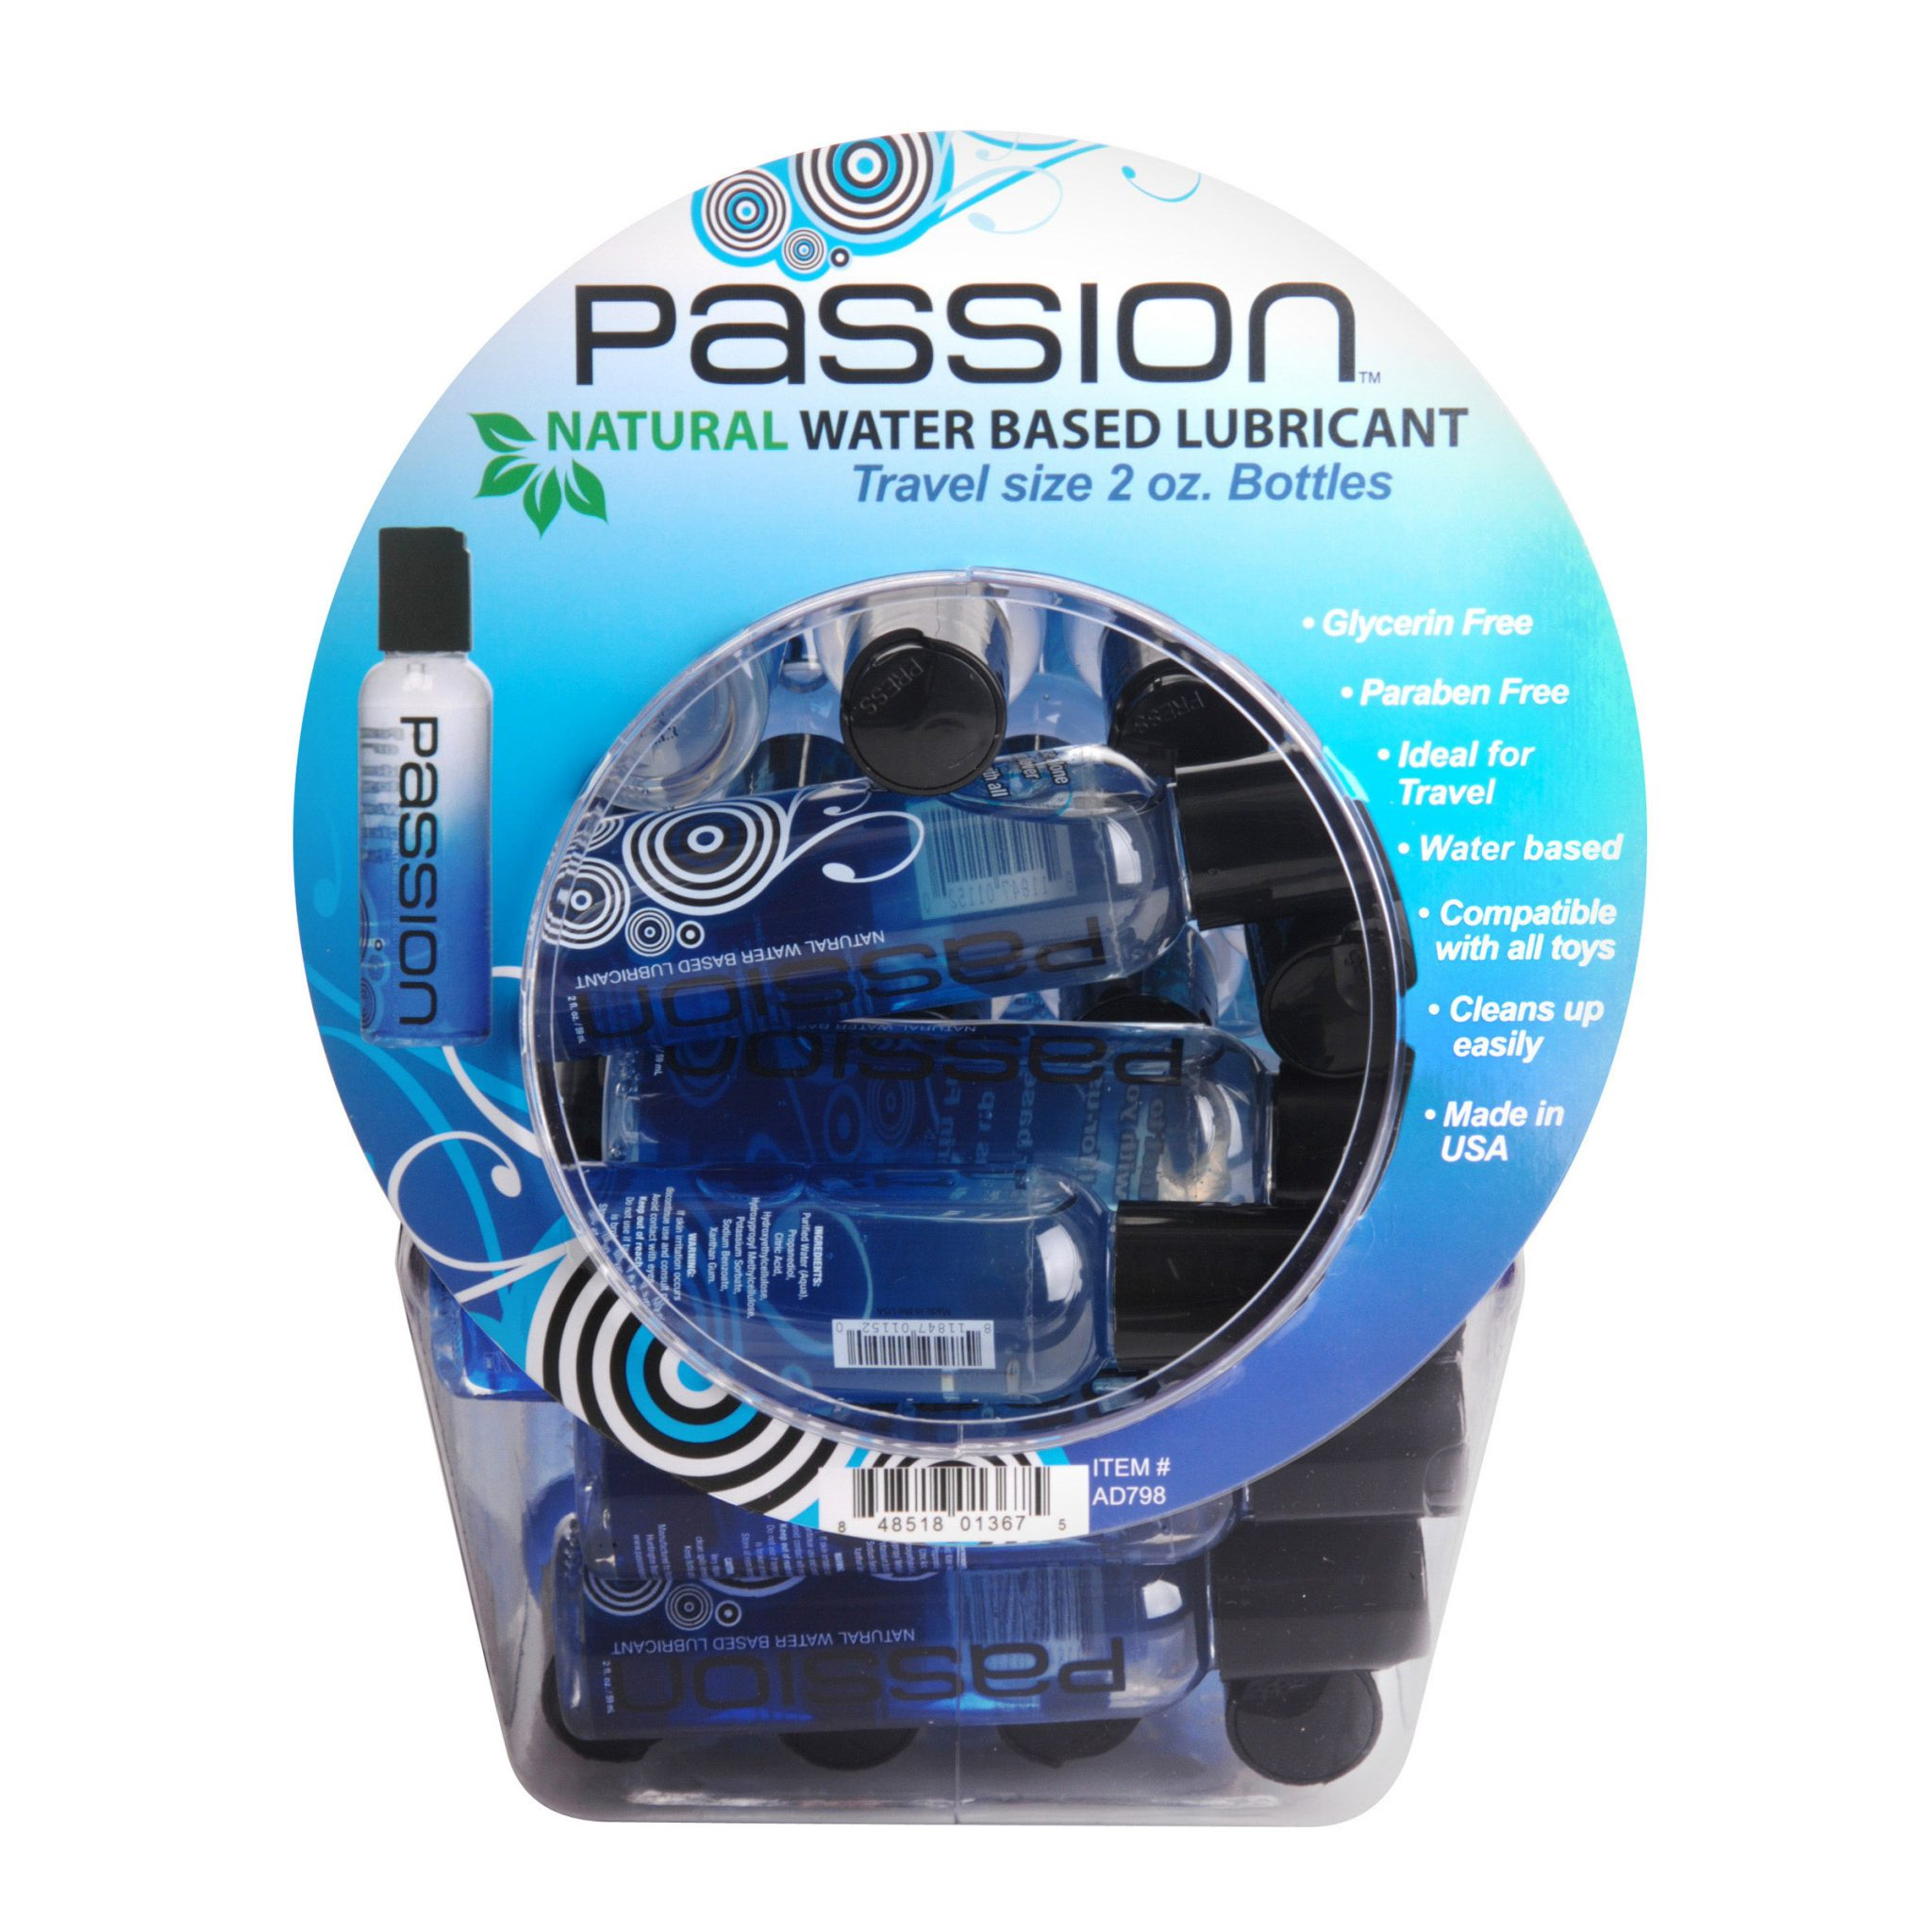 Passion Naturals Fishbowl Retail Display- 30 Piece Display